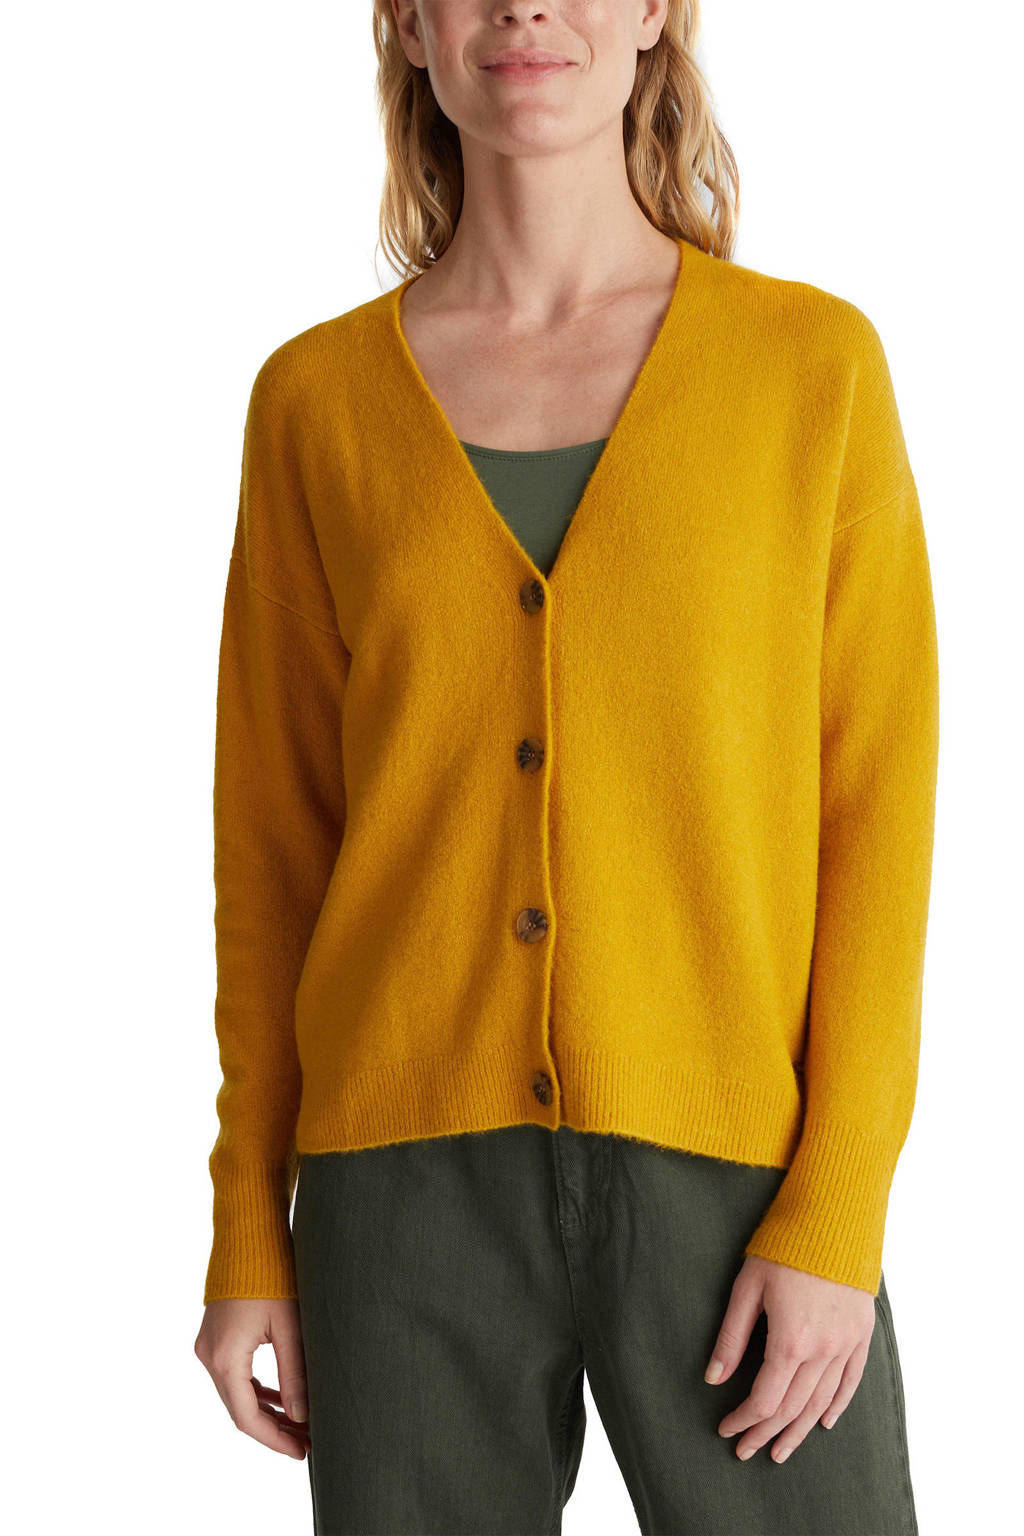 ESPRIT Women Casual vest okergeel/bruin, Okergeel/bruin